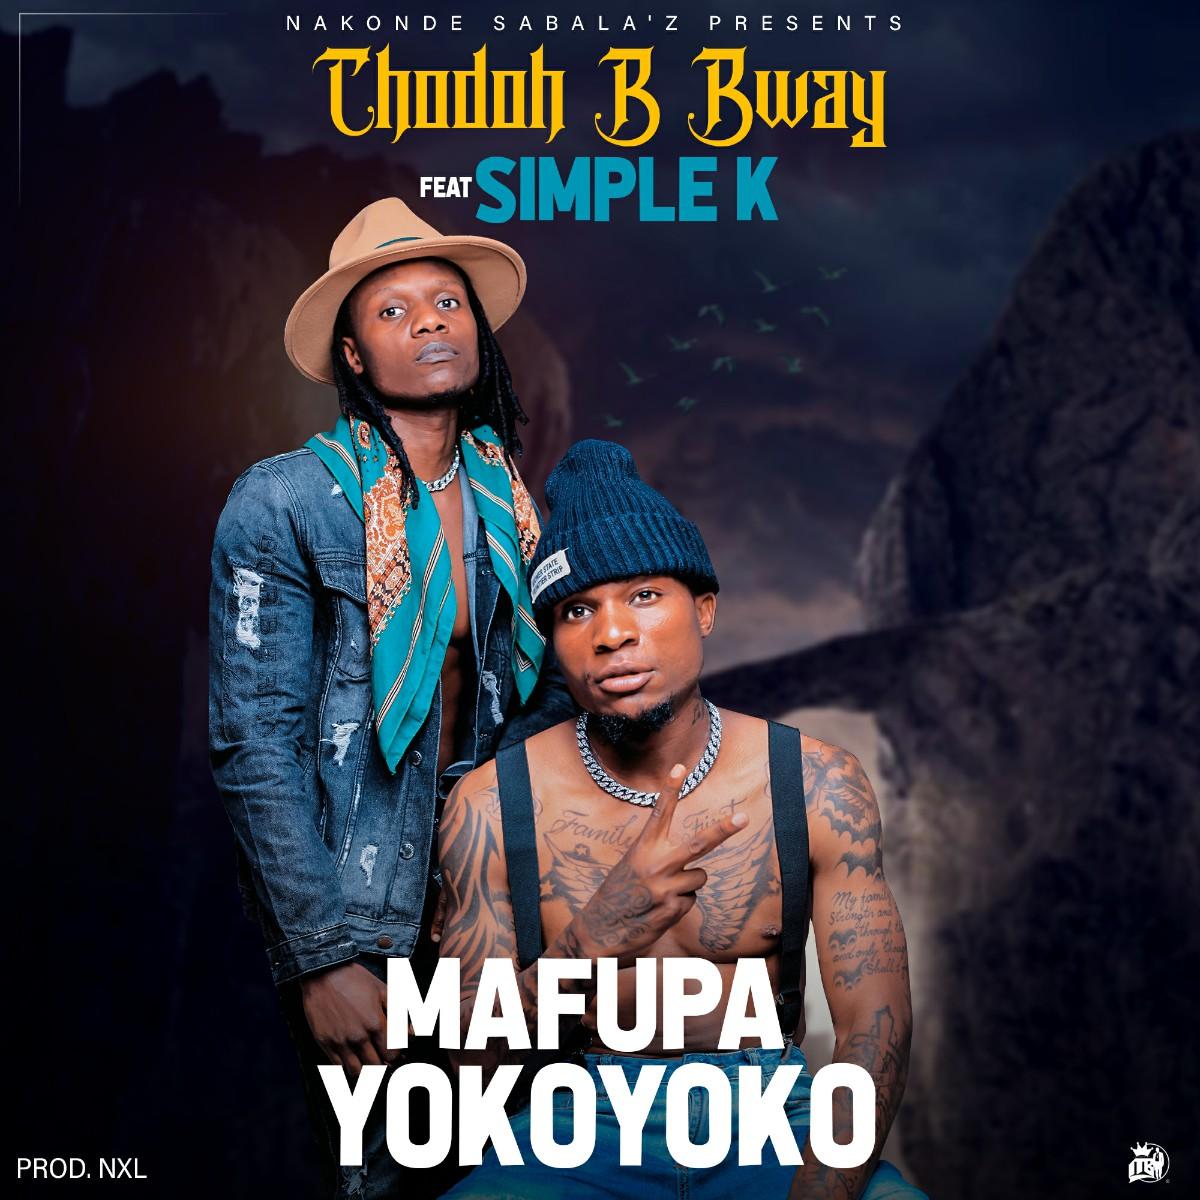 Chodoh B Bway ft. Simple K - Mafupa Yokoyoko